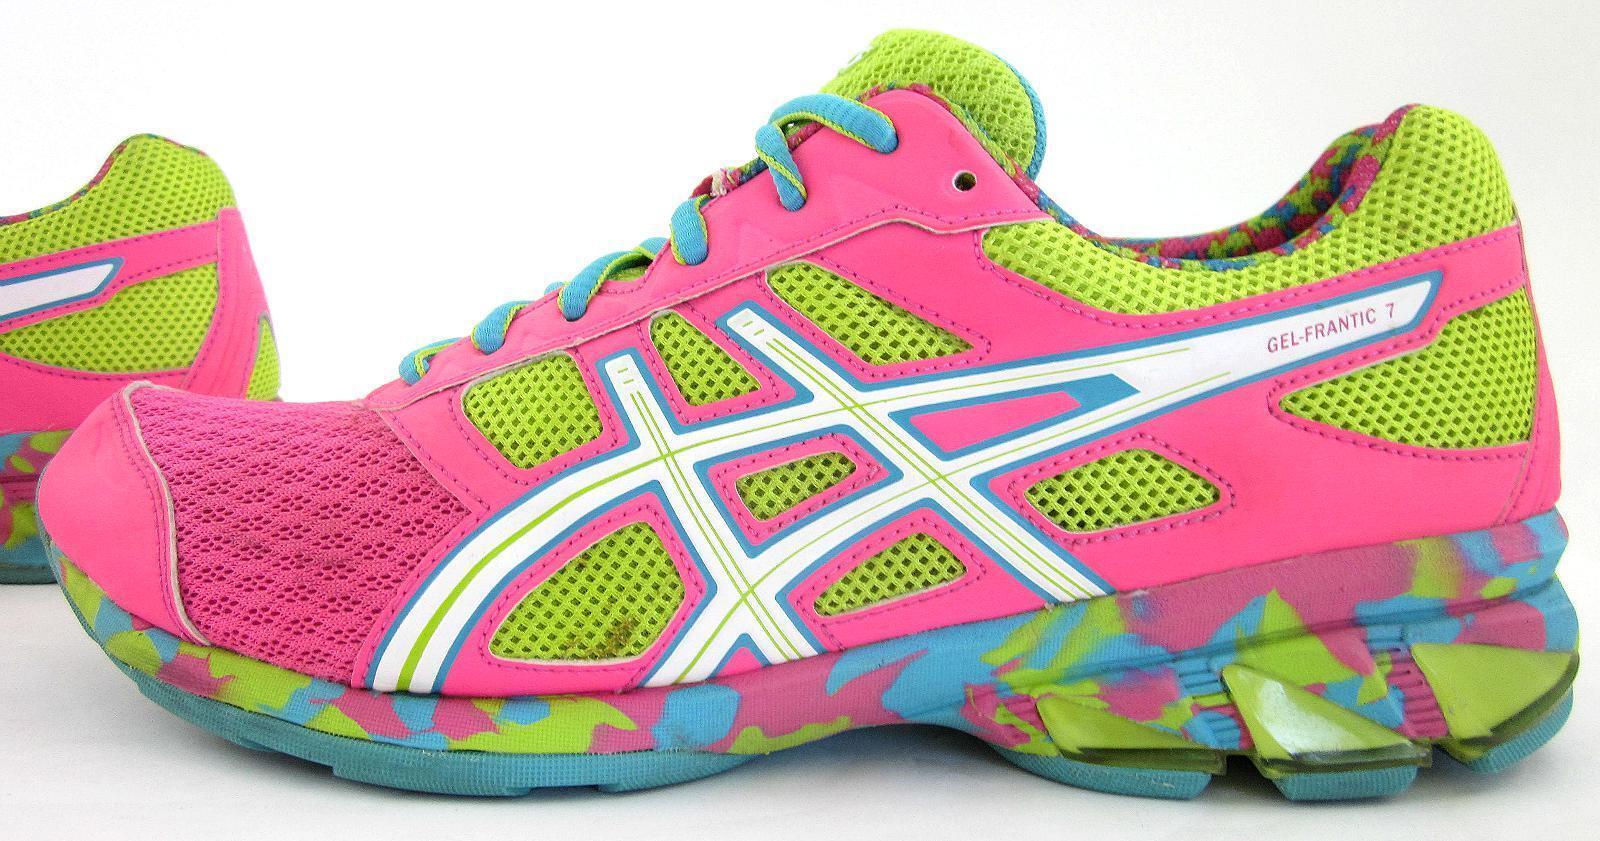 Asics Gel-Frantic 7 Womens Running shoes Hot Pink Neon Green White Sz 9.5